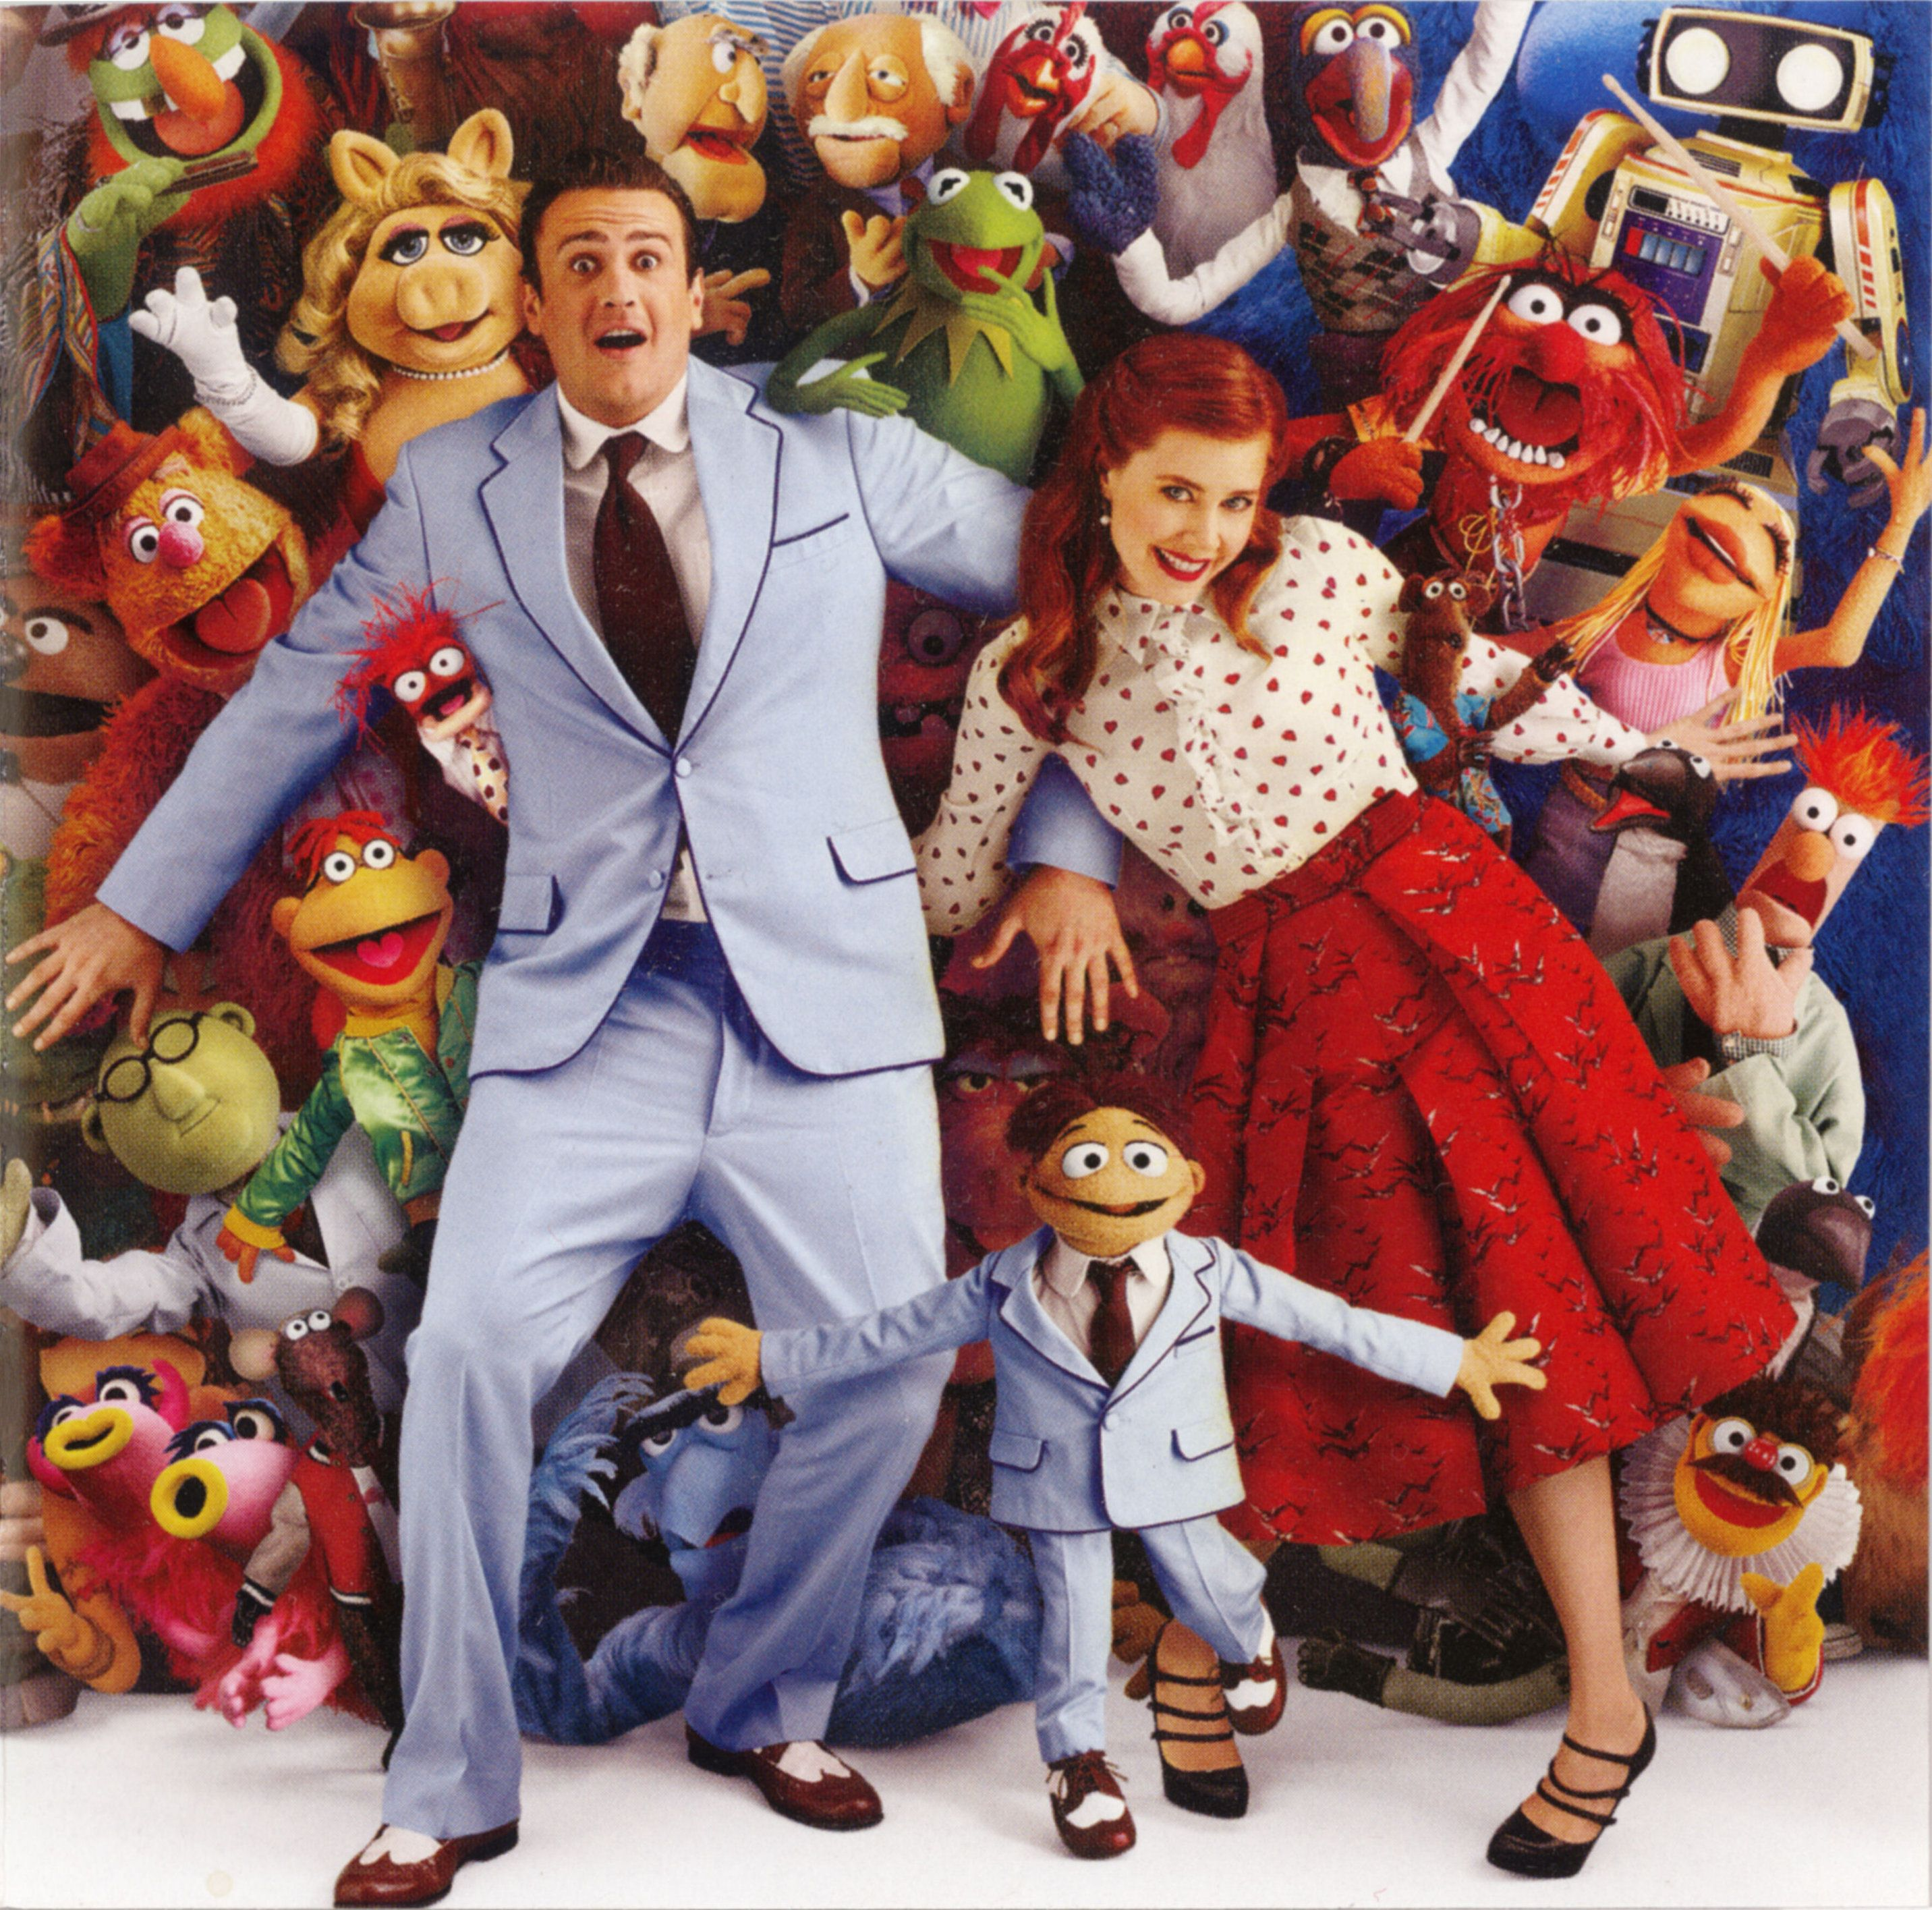 muppets 2018 movie release date - HD2864×2831